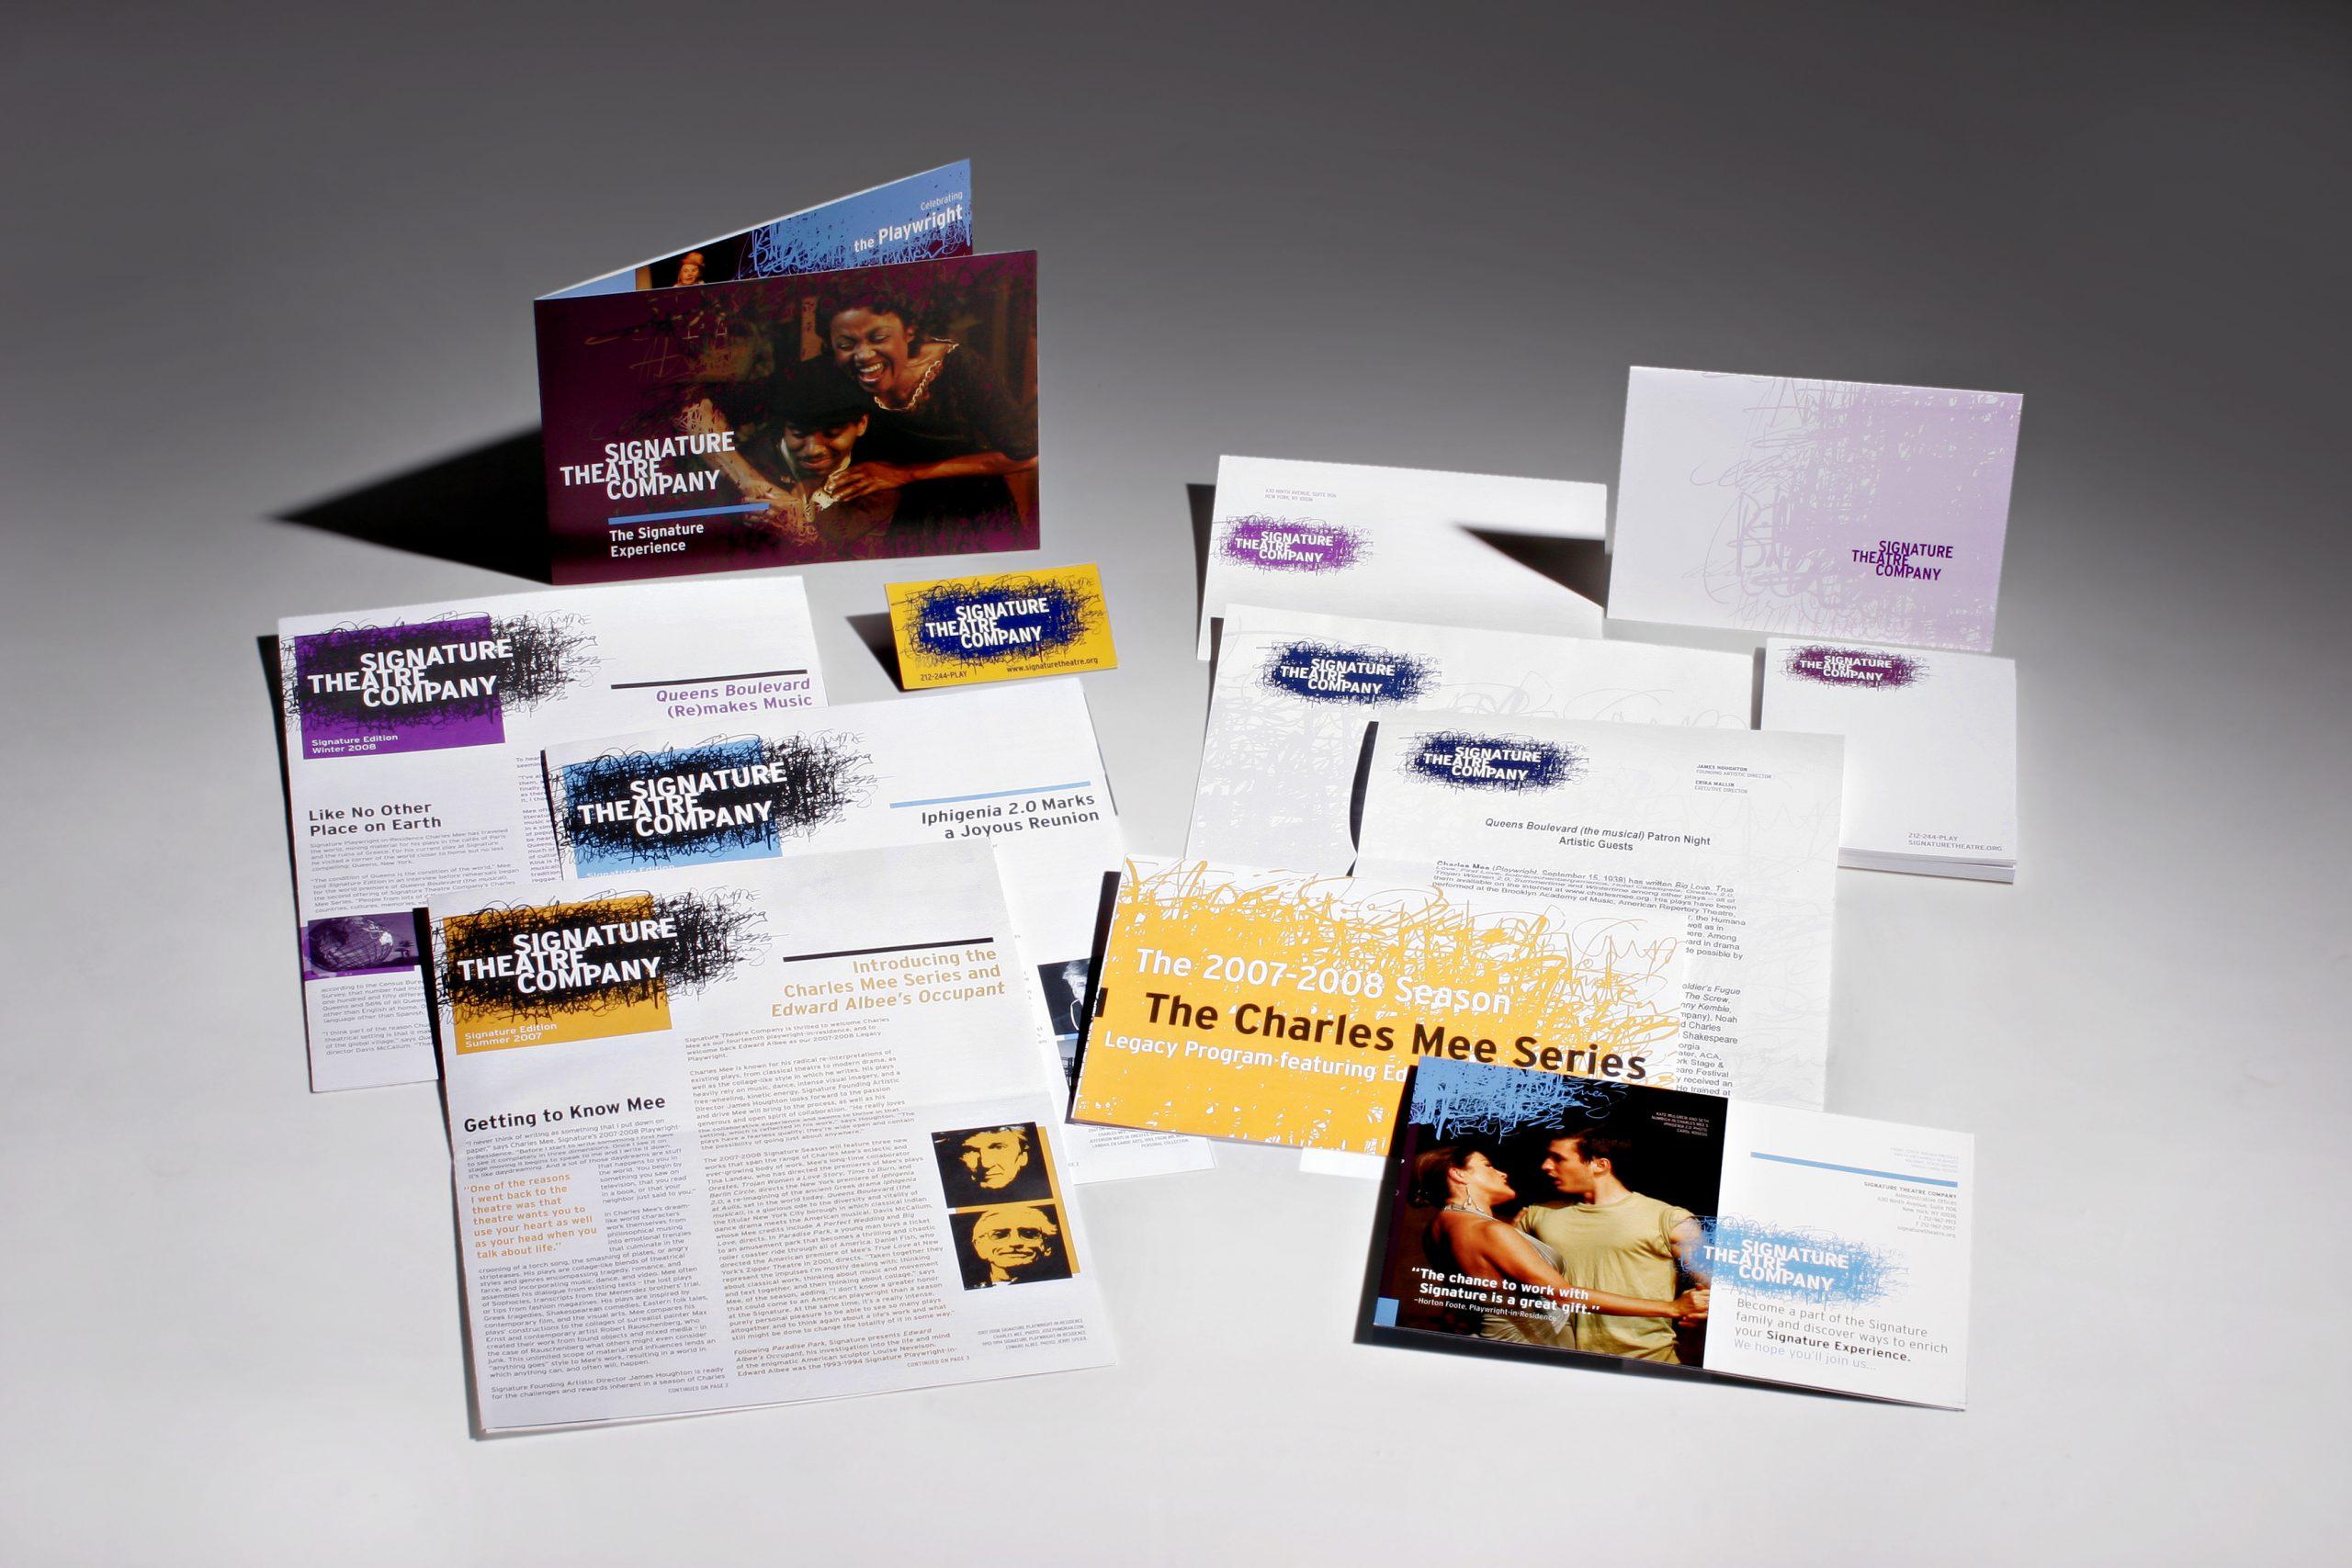 Project image 4 for Print Materials, Signature Theatre Company